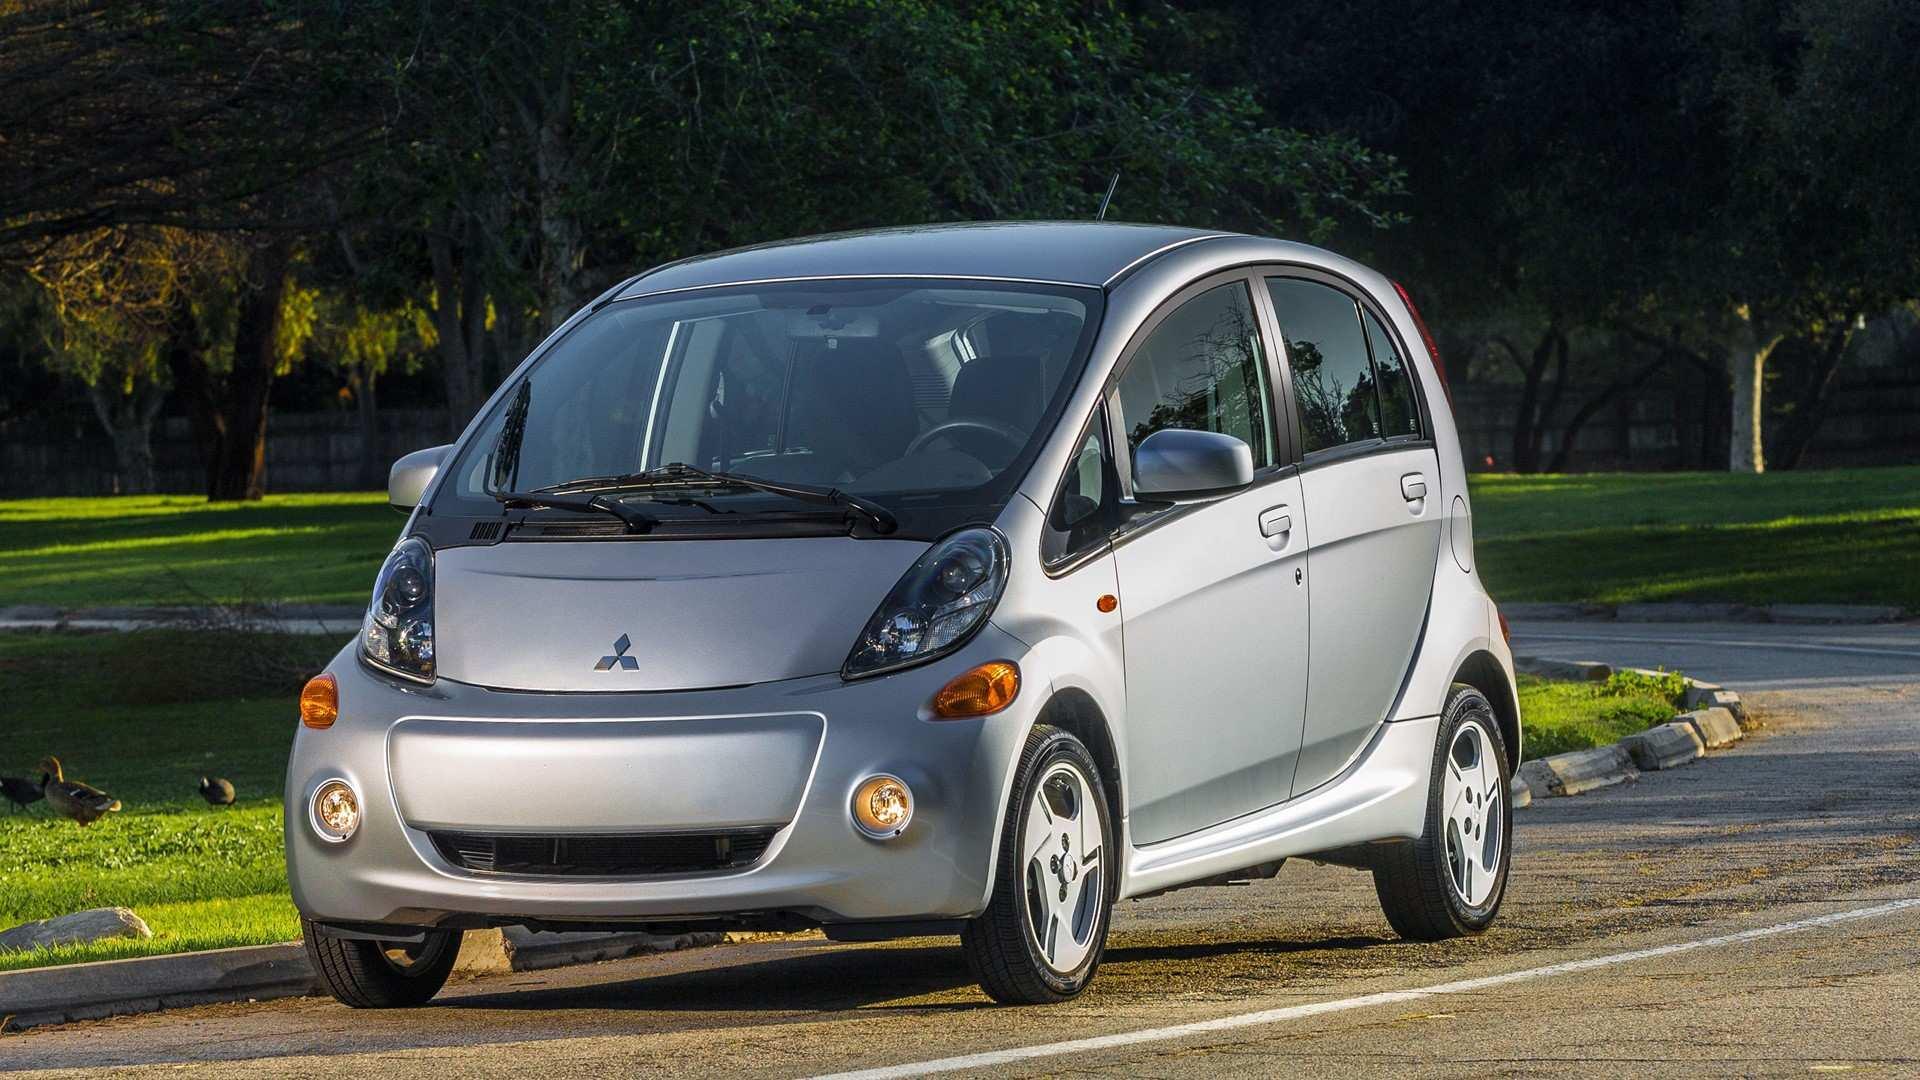 31 Best Review 2020 Mitsubishi I MIEV Rumors with 2020 Mitsubishi I MIEV